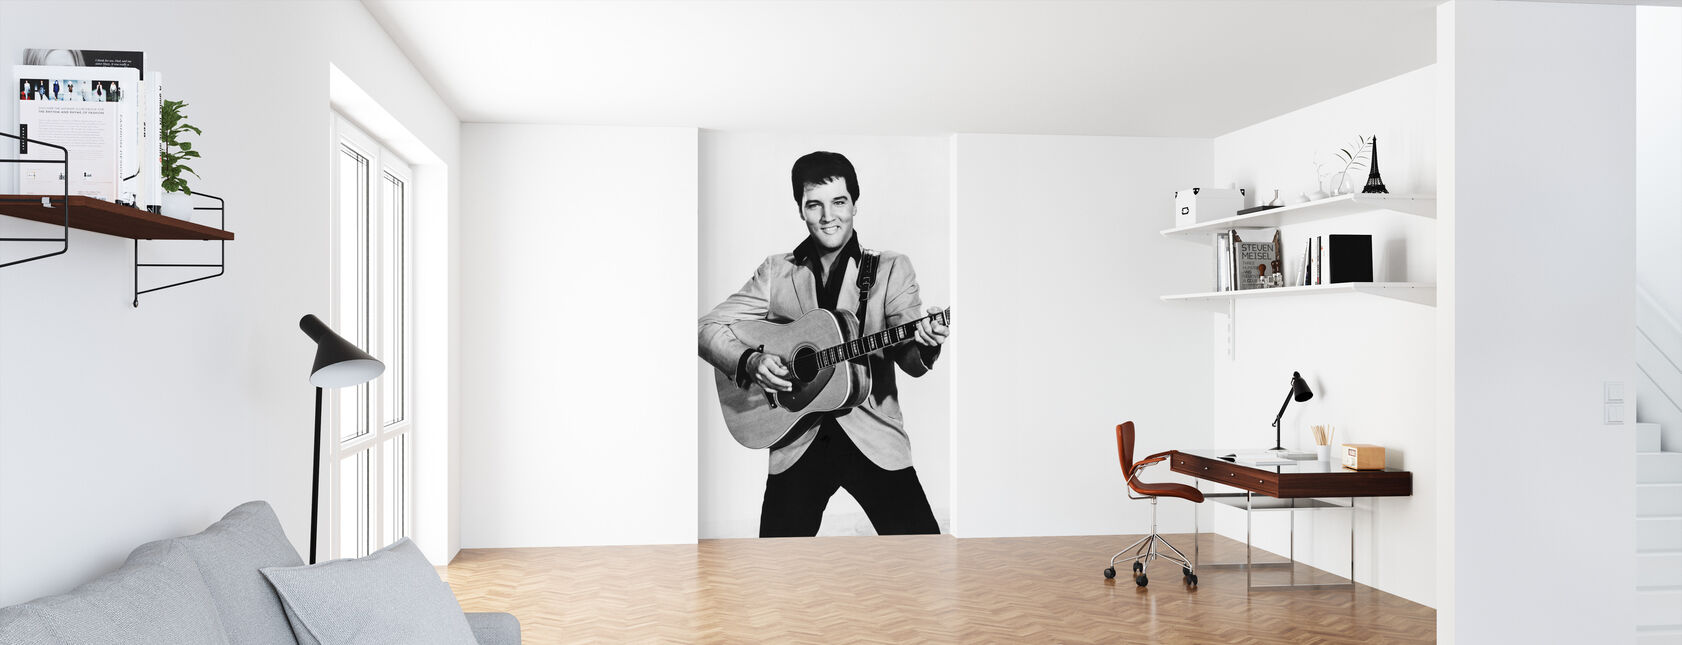 Kungen 1960-talet - Tapet - Kontor